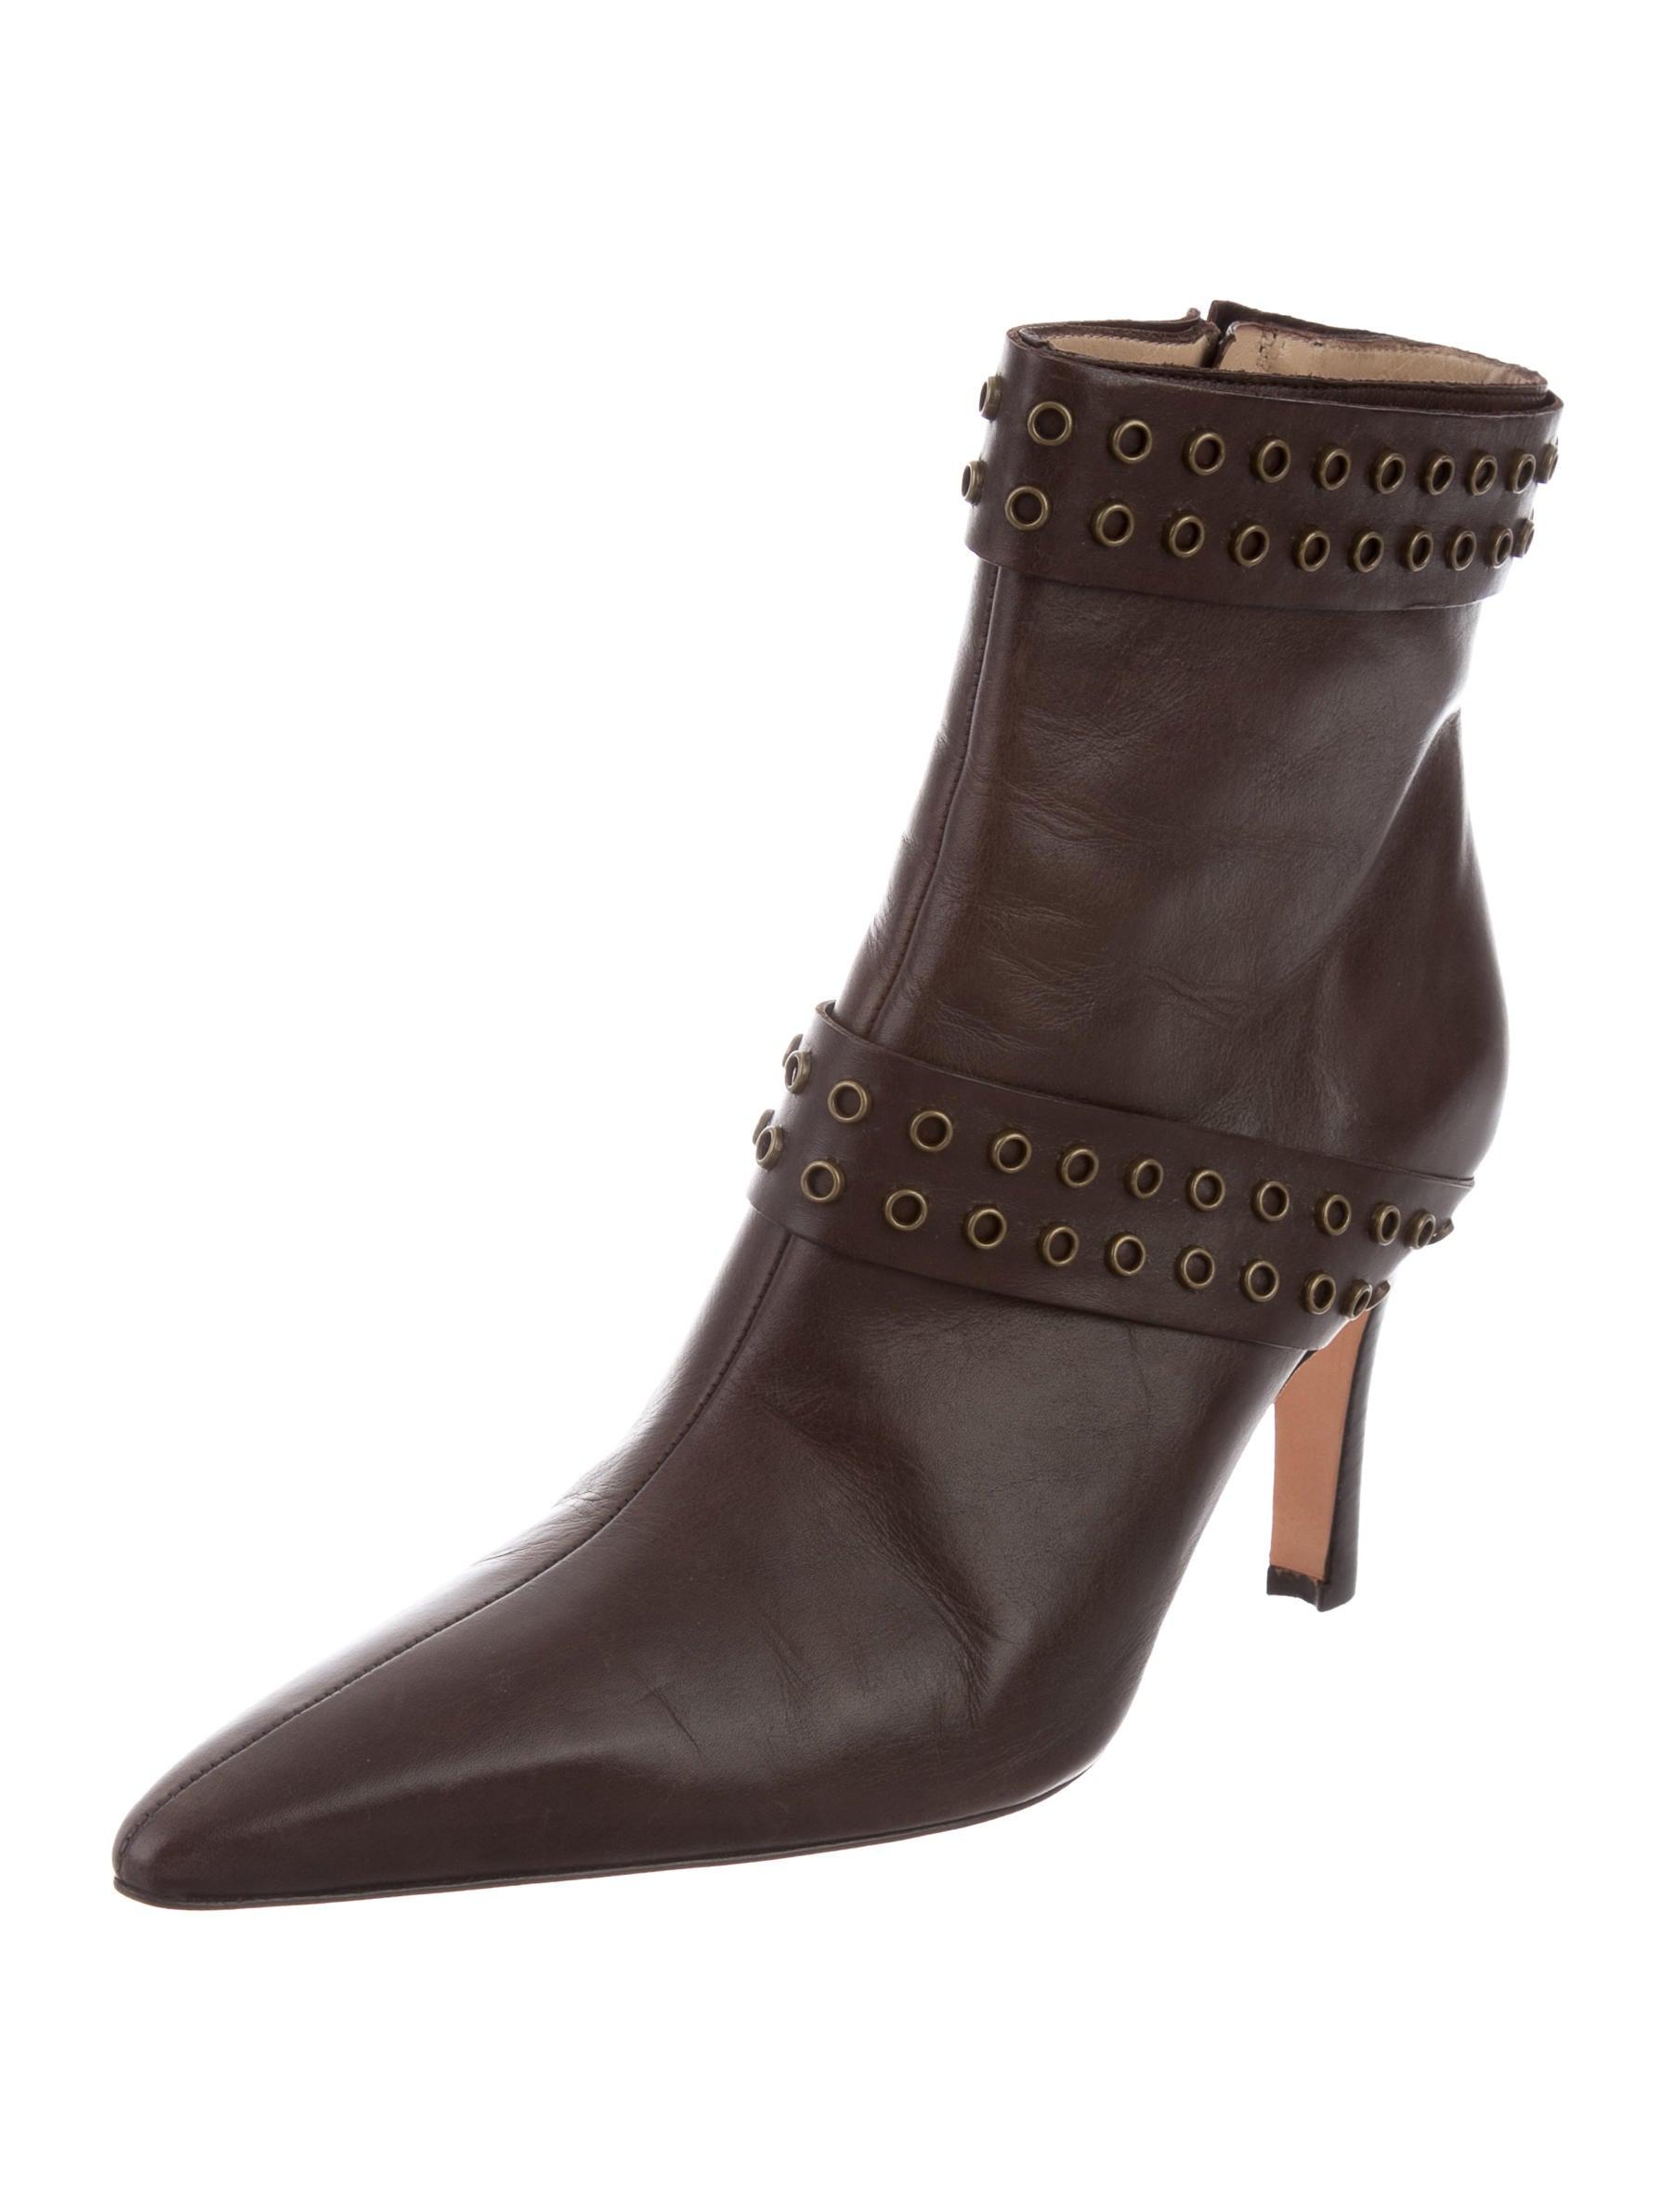 pre order sale online Manolo Blahnik Leather Grommet Booties eastbay best store to get PA0XXpdcA